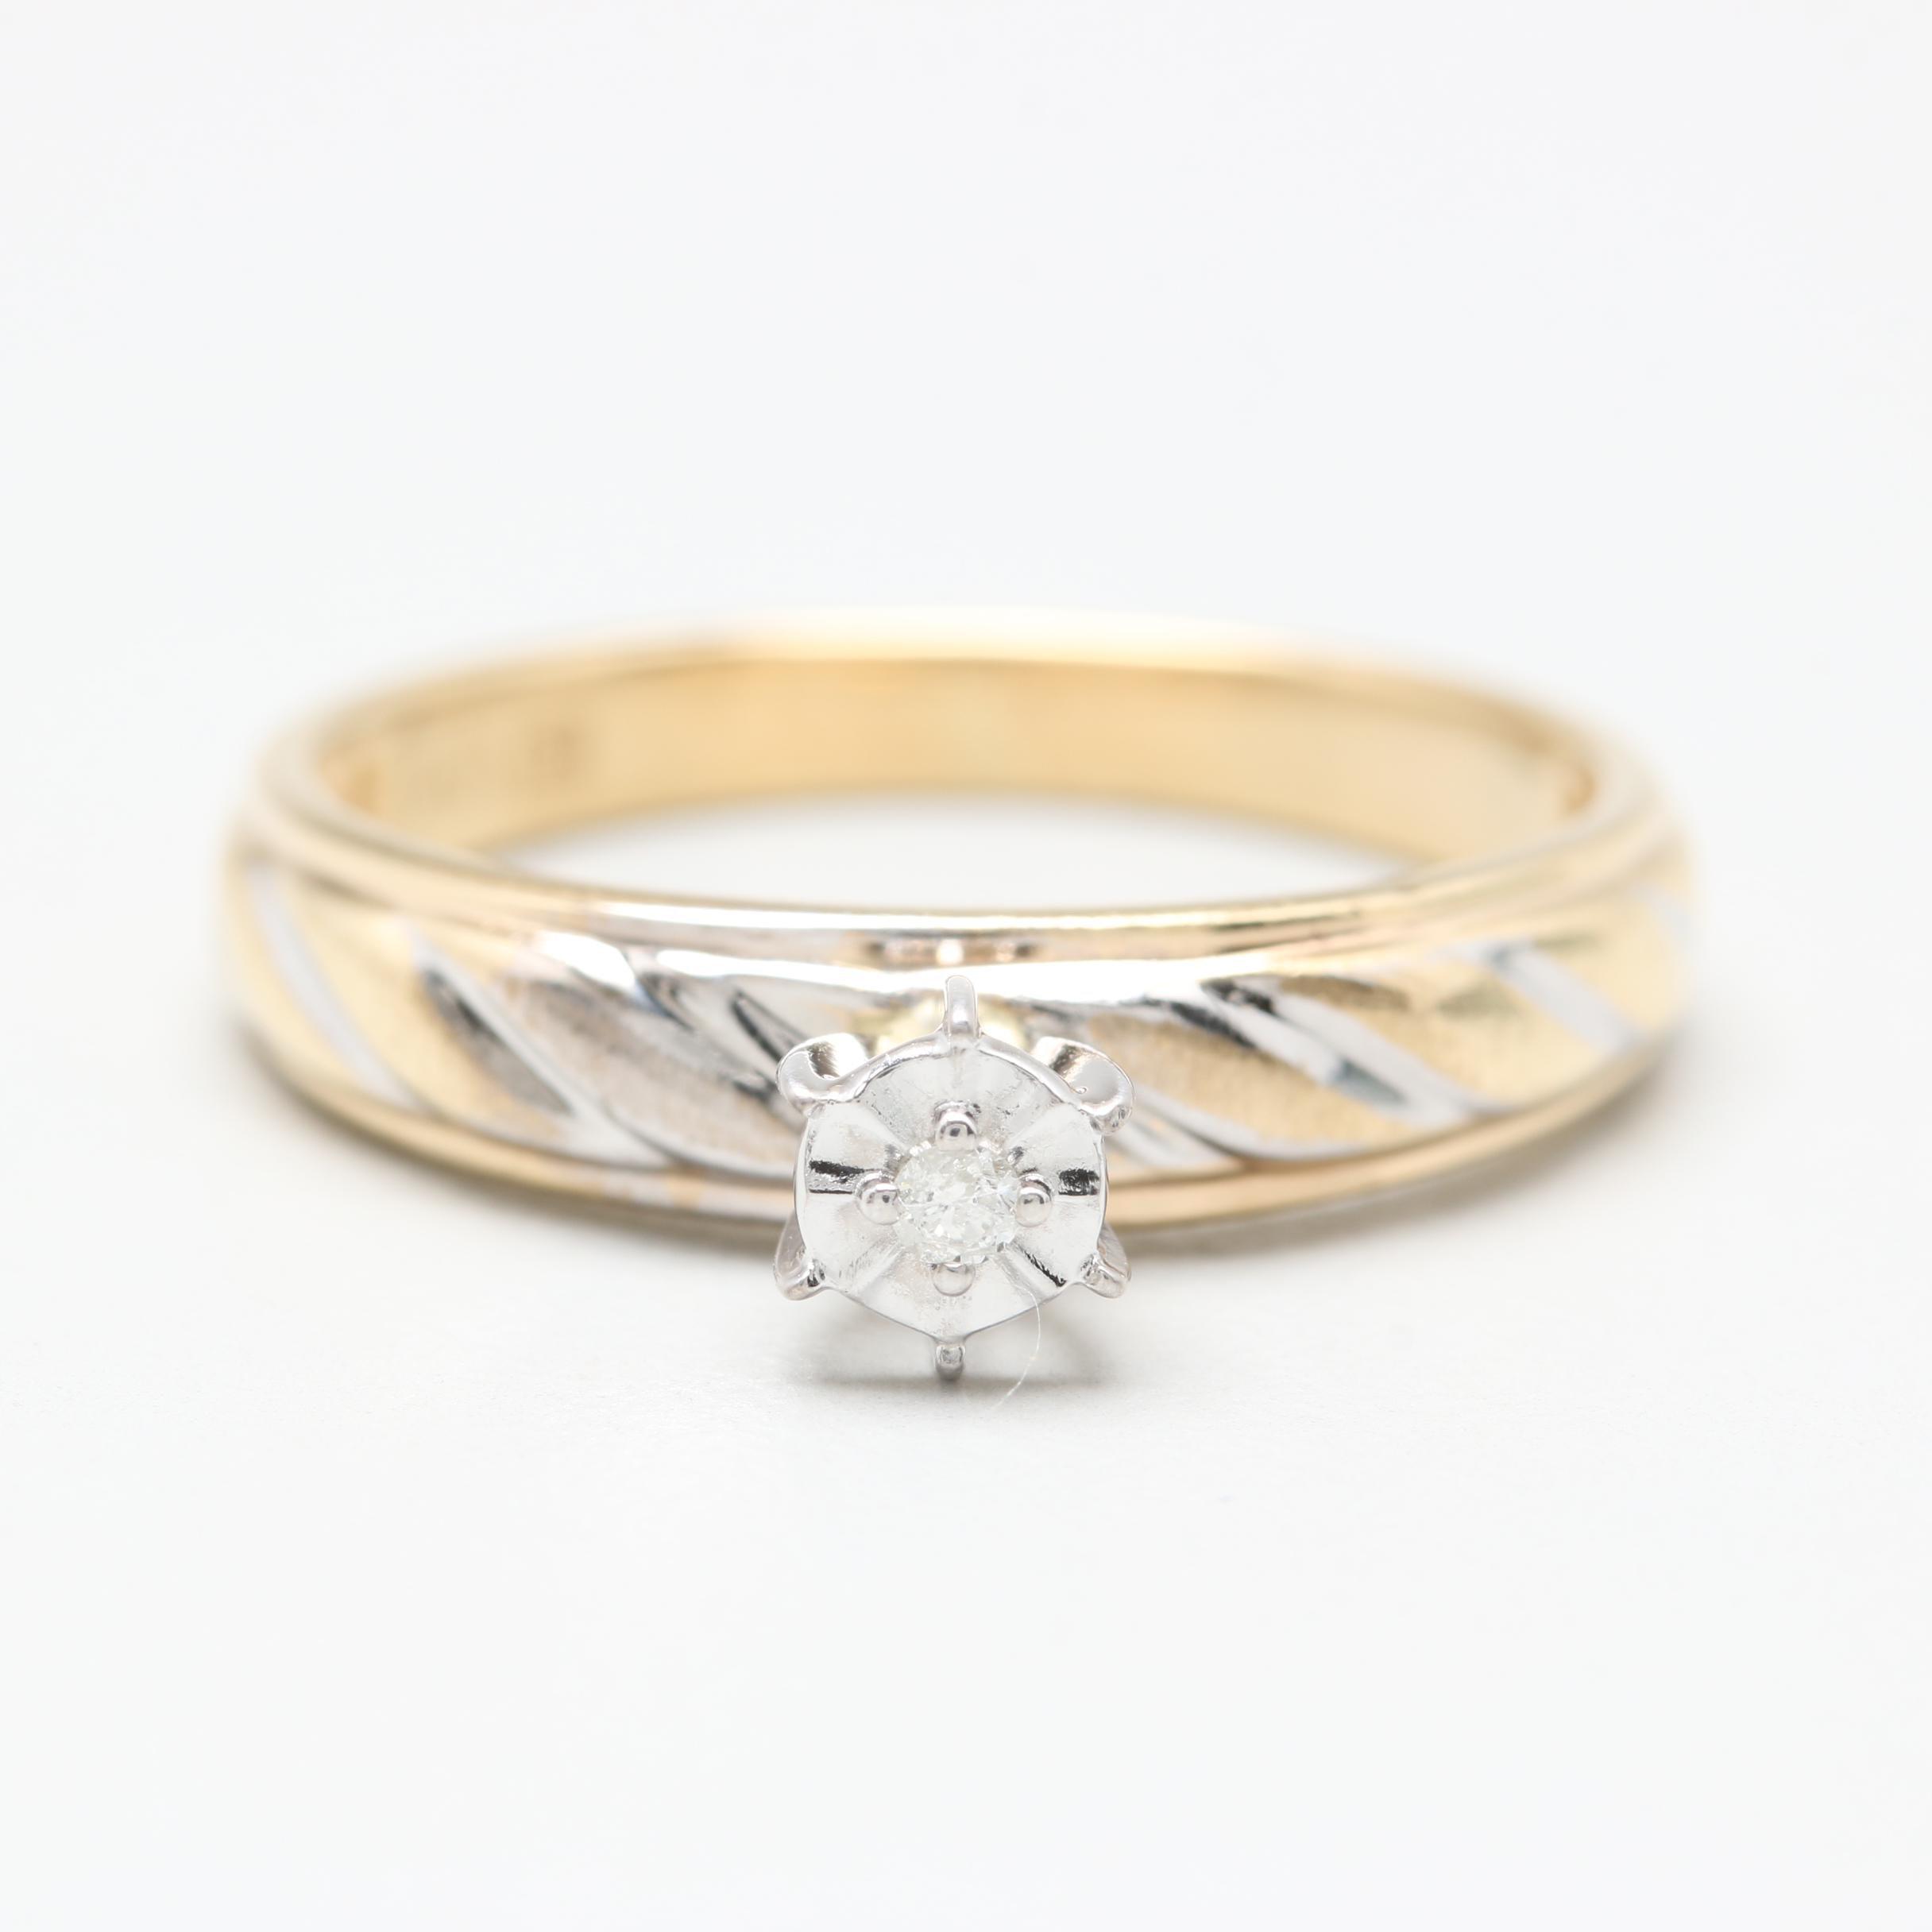 10K Yellow Gold Illusion Set Diamond Solitaire Ring